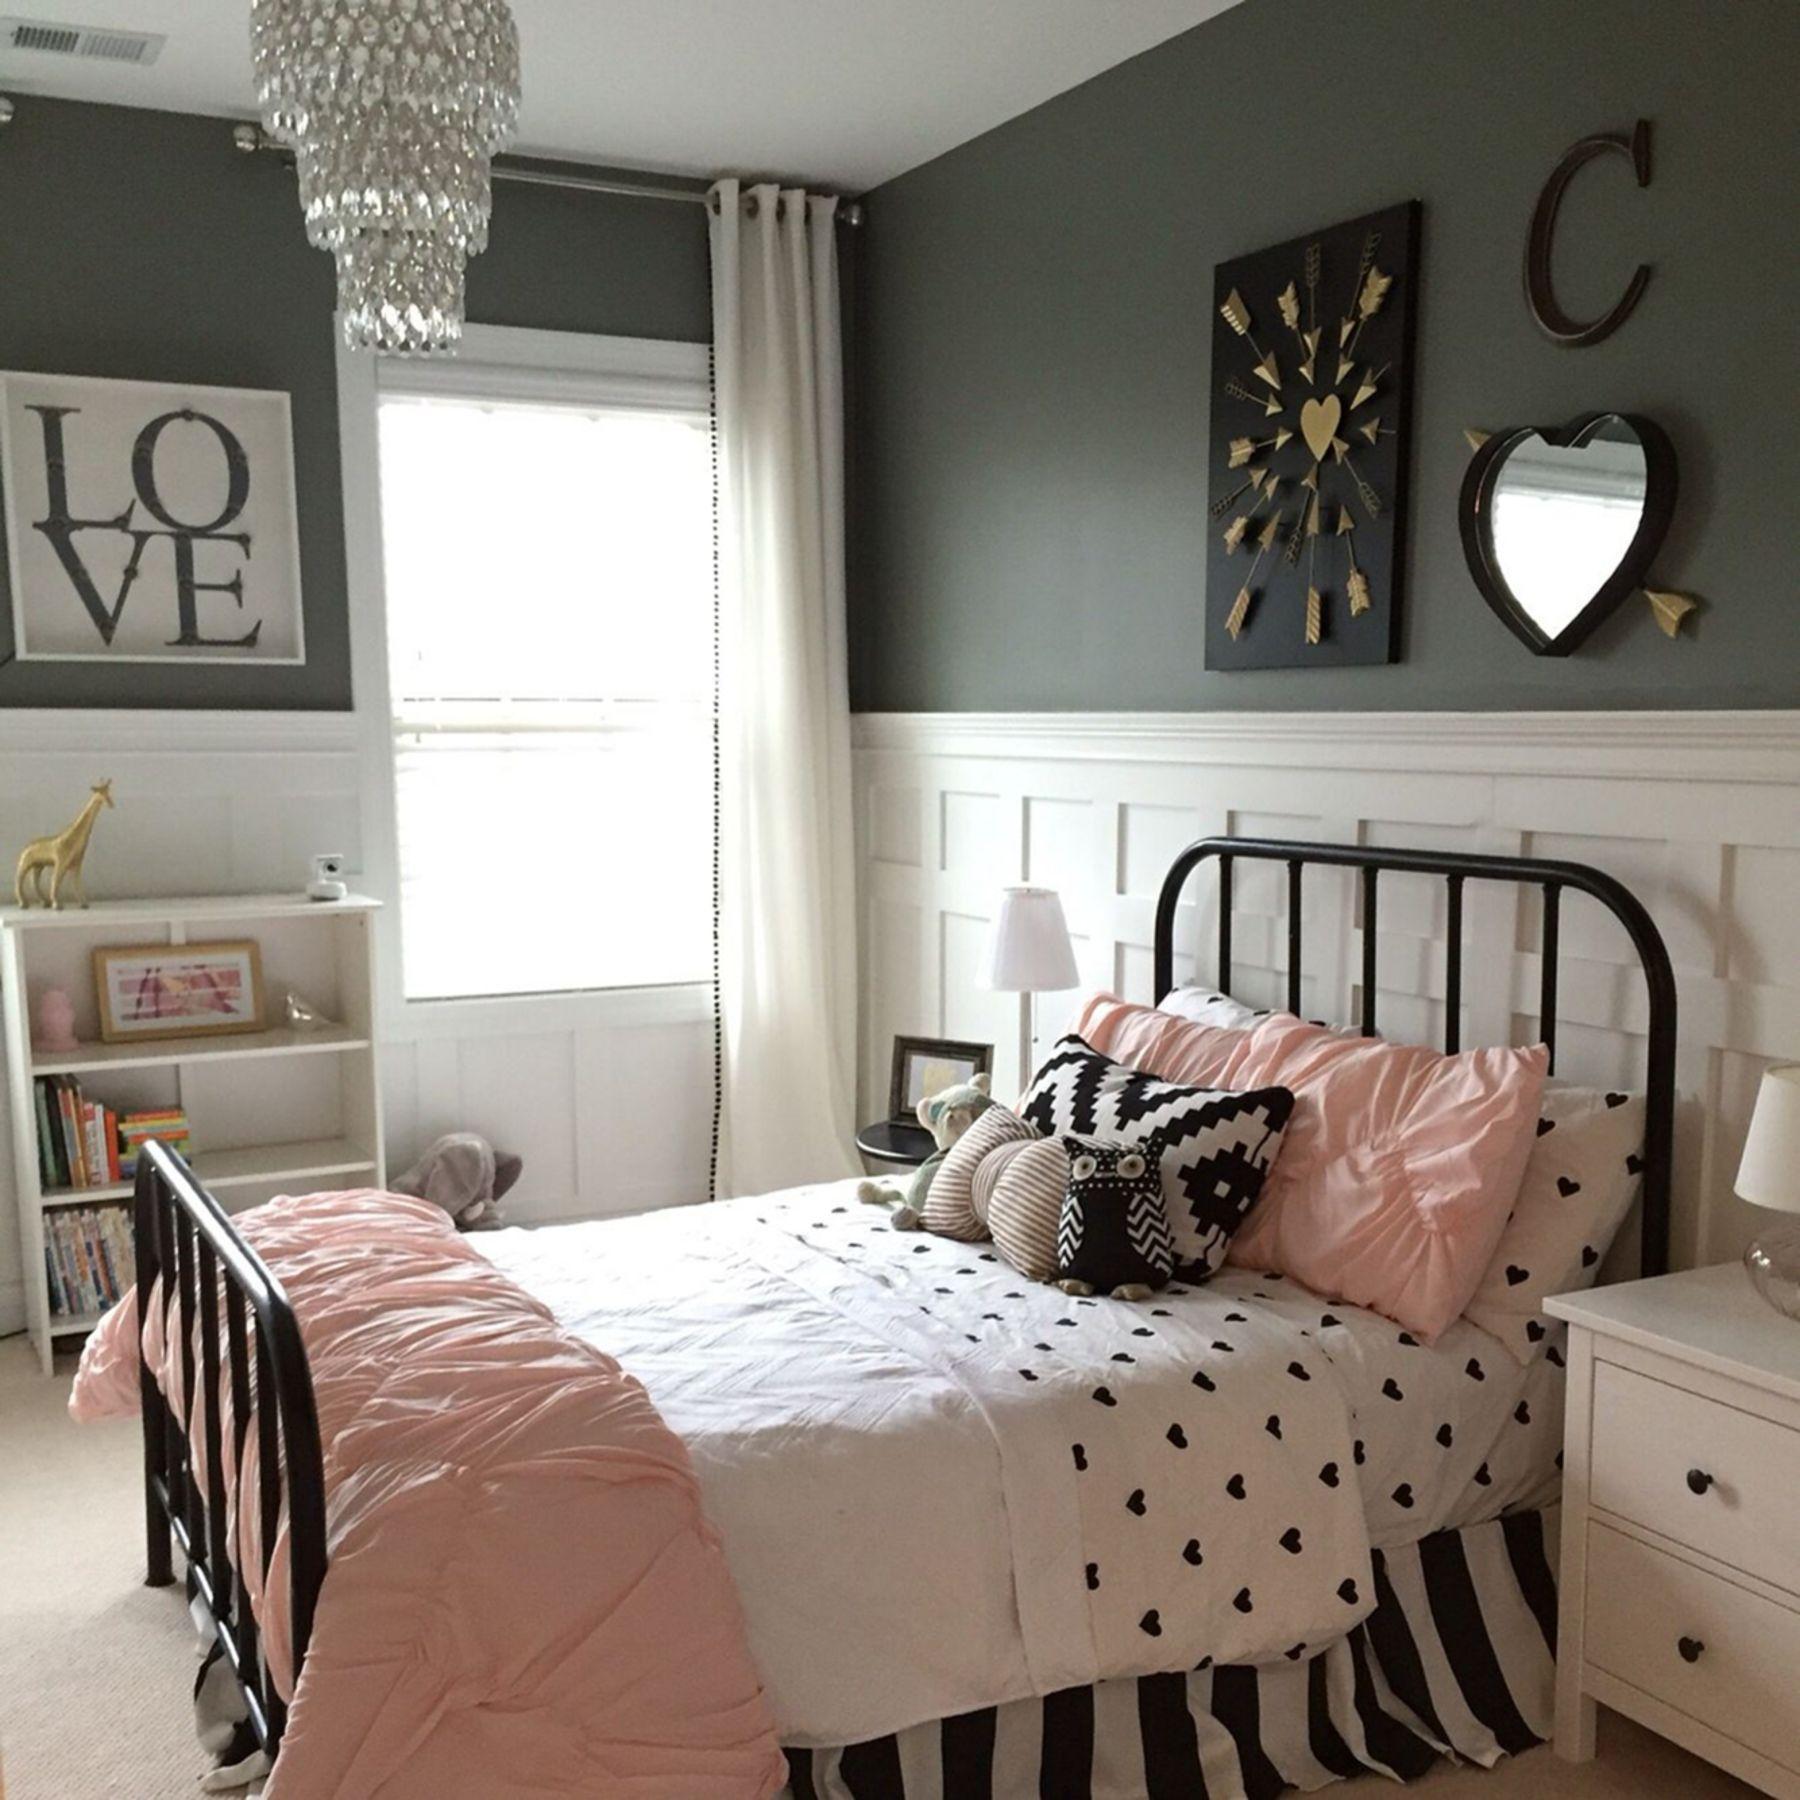 15 Beautiful Teenage Girl Bedroom Design Ideas To Make Your Teenage Girl Happy images